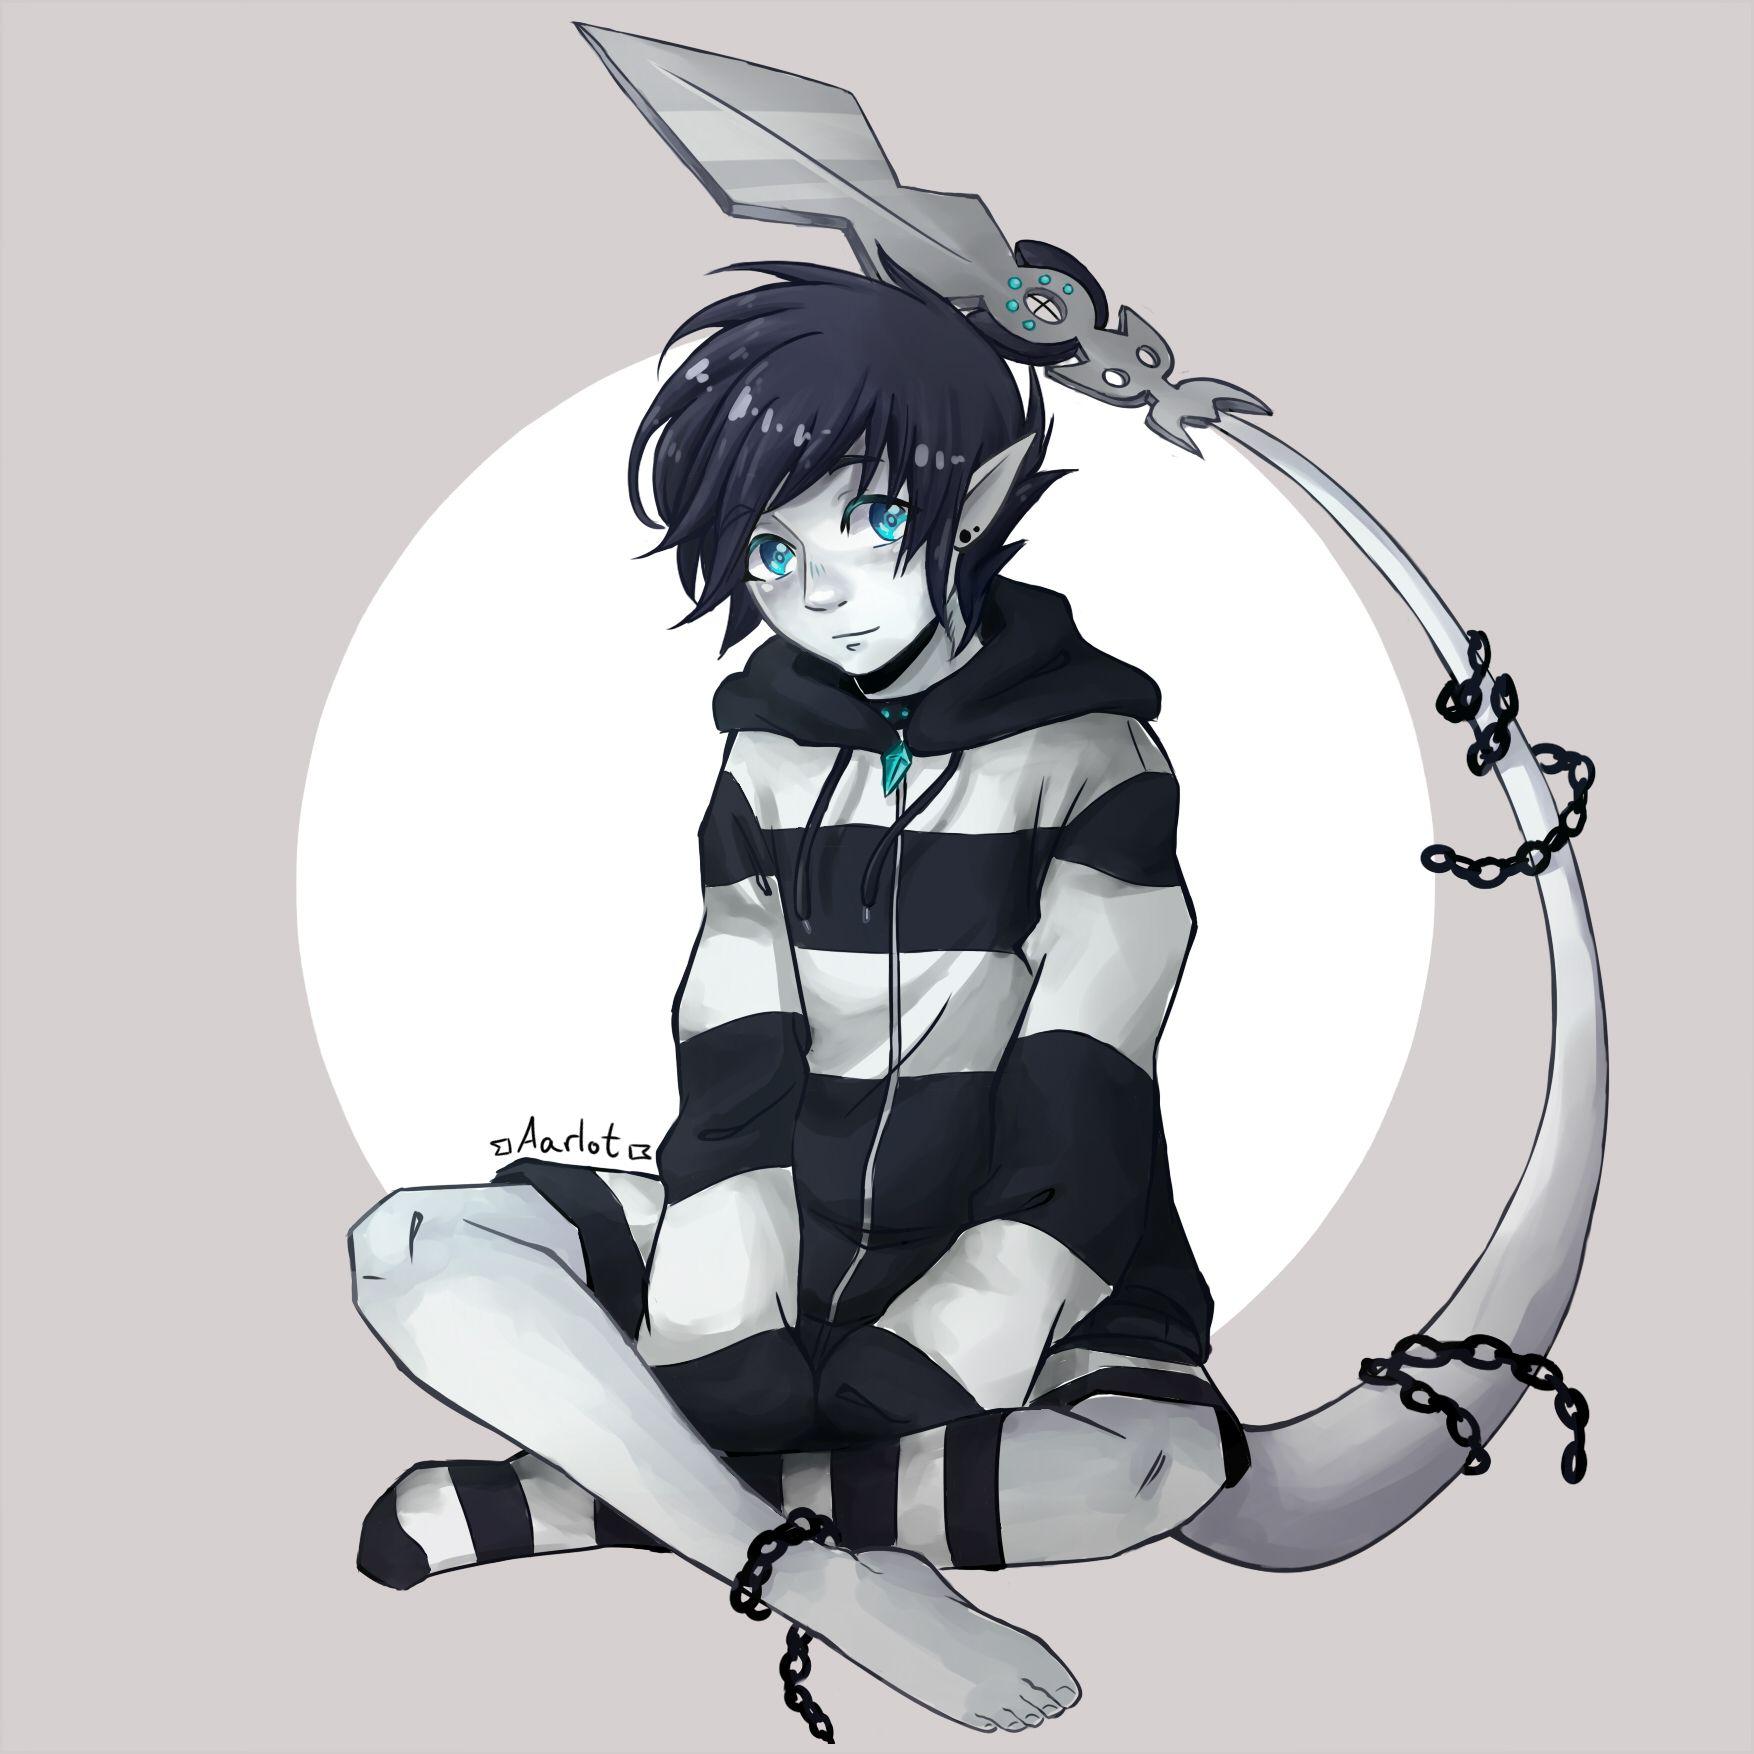 Digital Art Boy Demon Anime Tail Fantasy Painttollsai Aarlot Aarlotyoru Anime Anime Art Fantasy Anime Art Tutorial